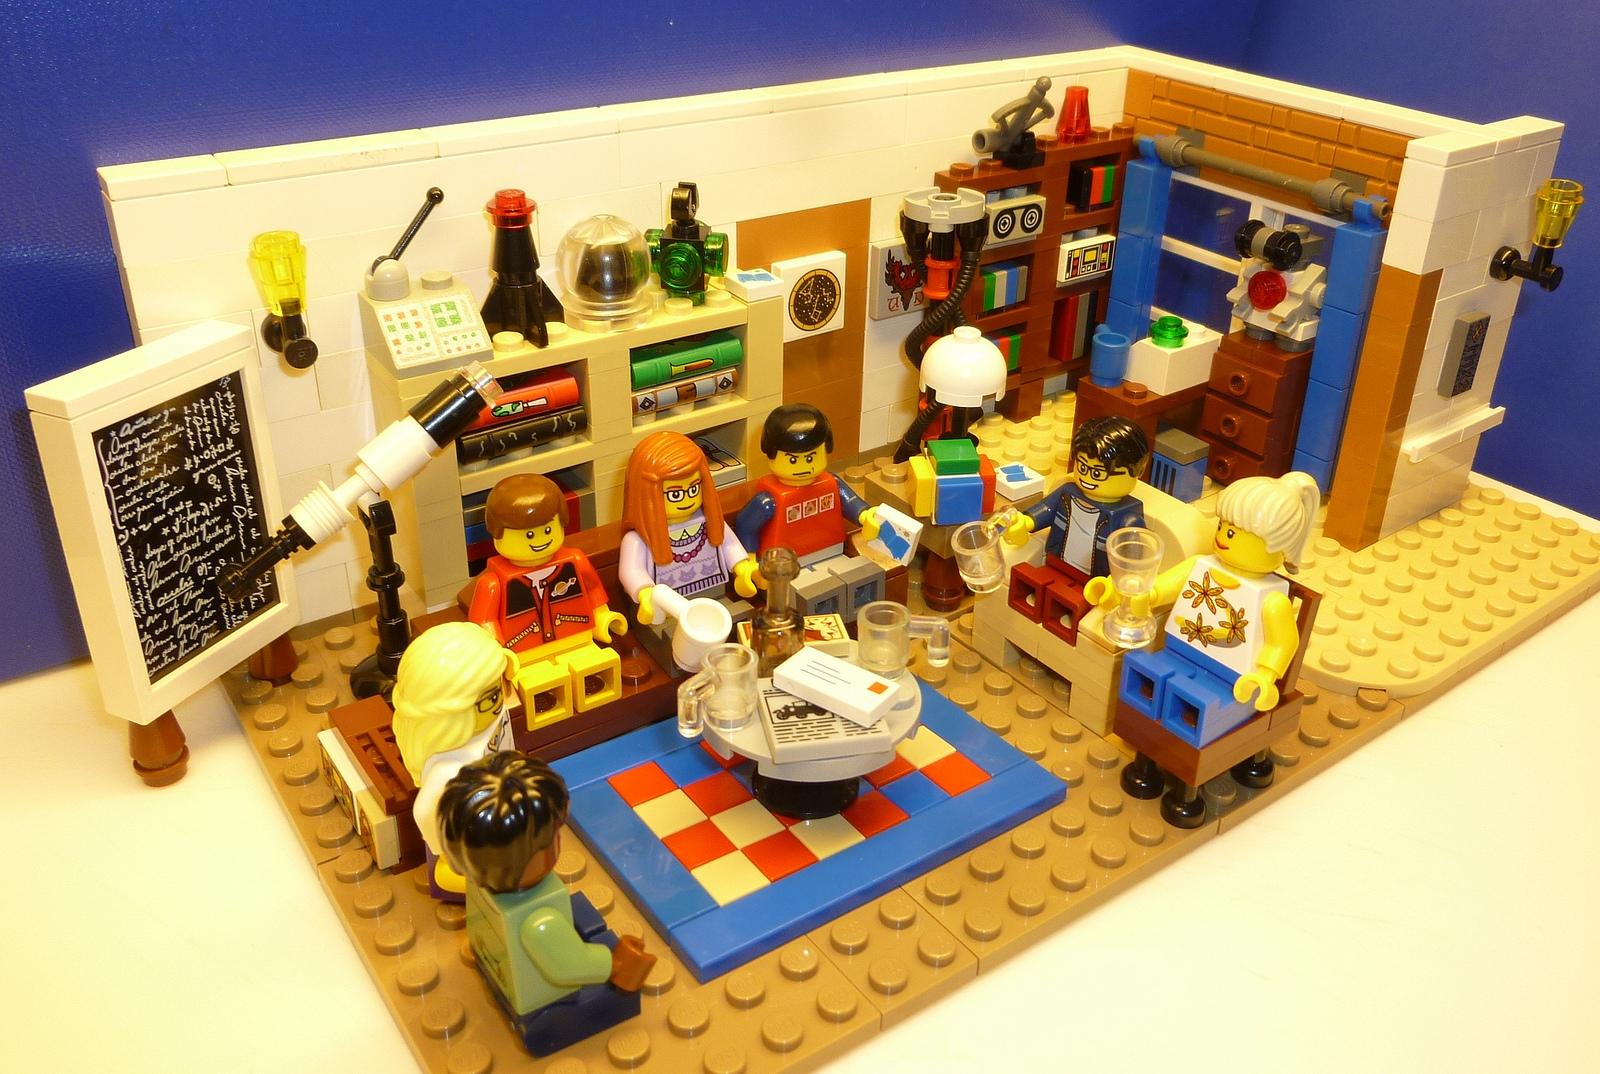 Il set Lego Cuusoo dedicato a The Big Bang Theory